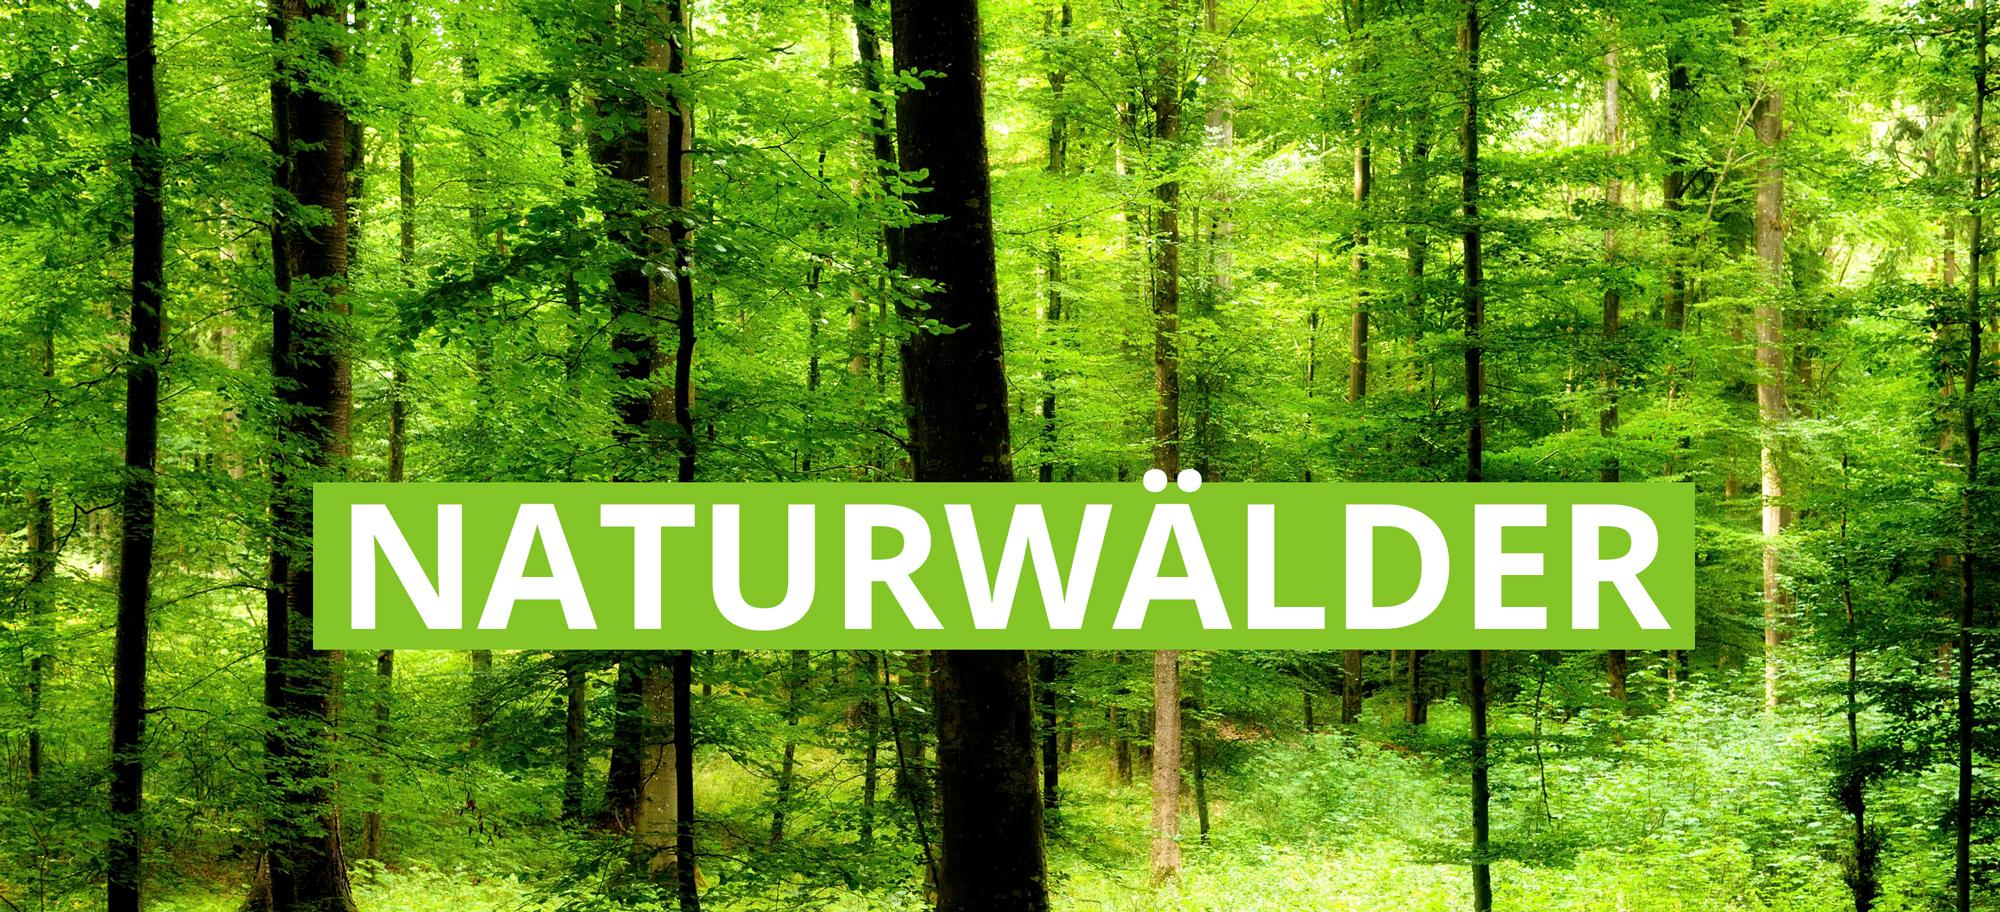 Naturwälder